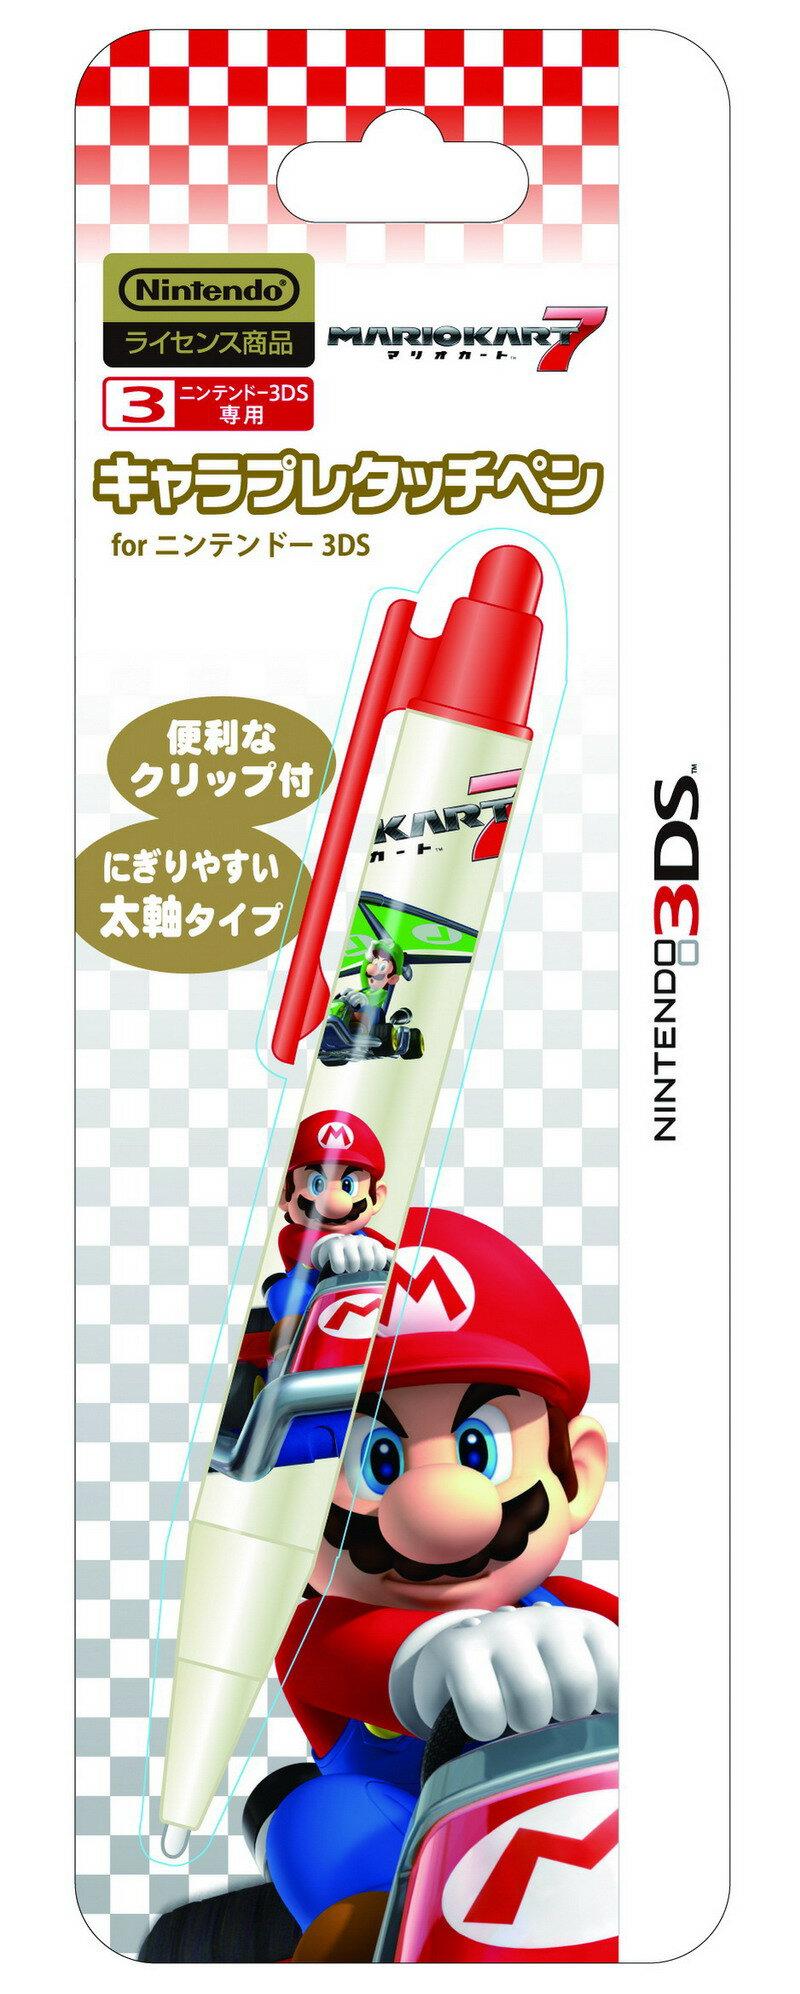 [3DS 周邊] 3DS 觸控筆 瑪利歐賽車 公司貨